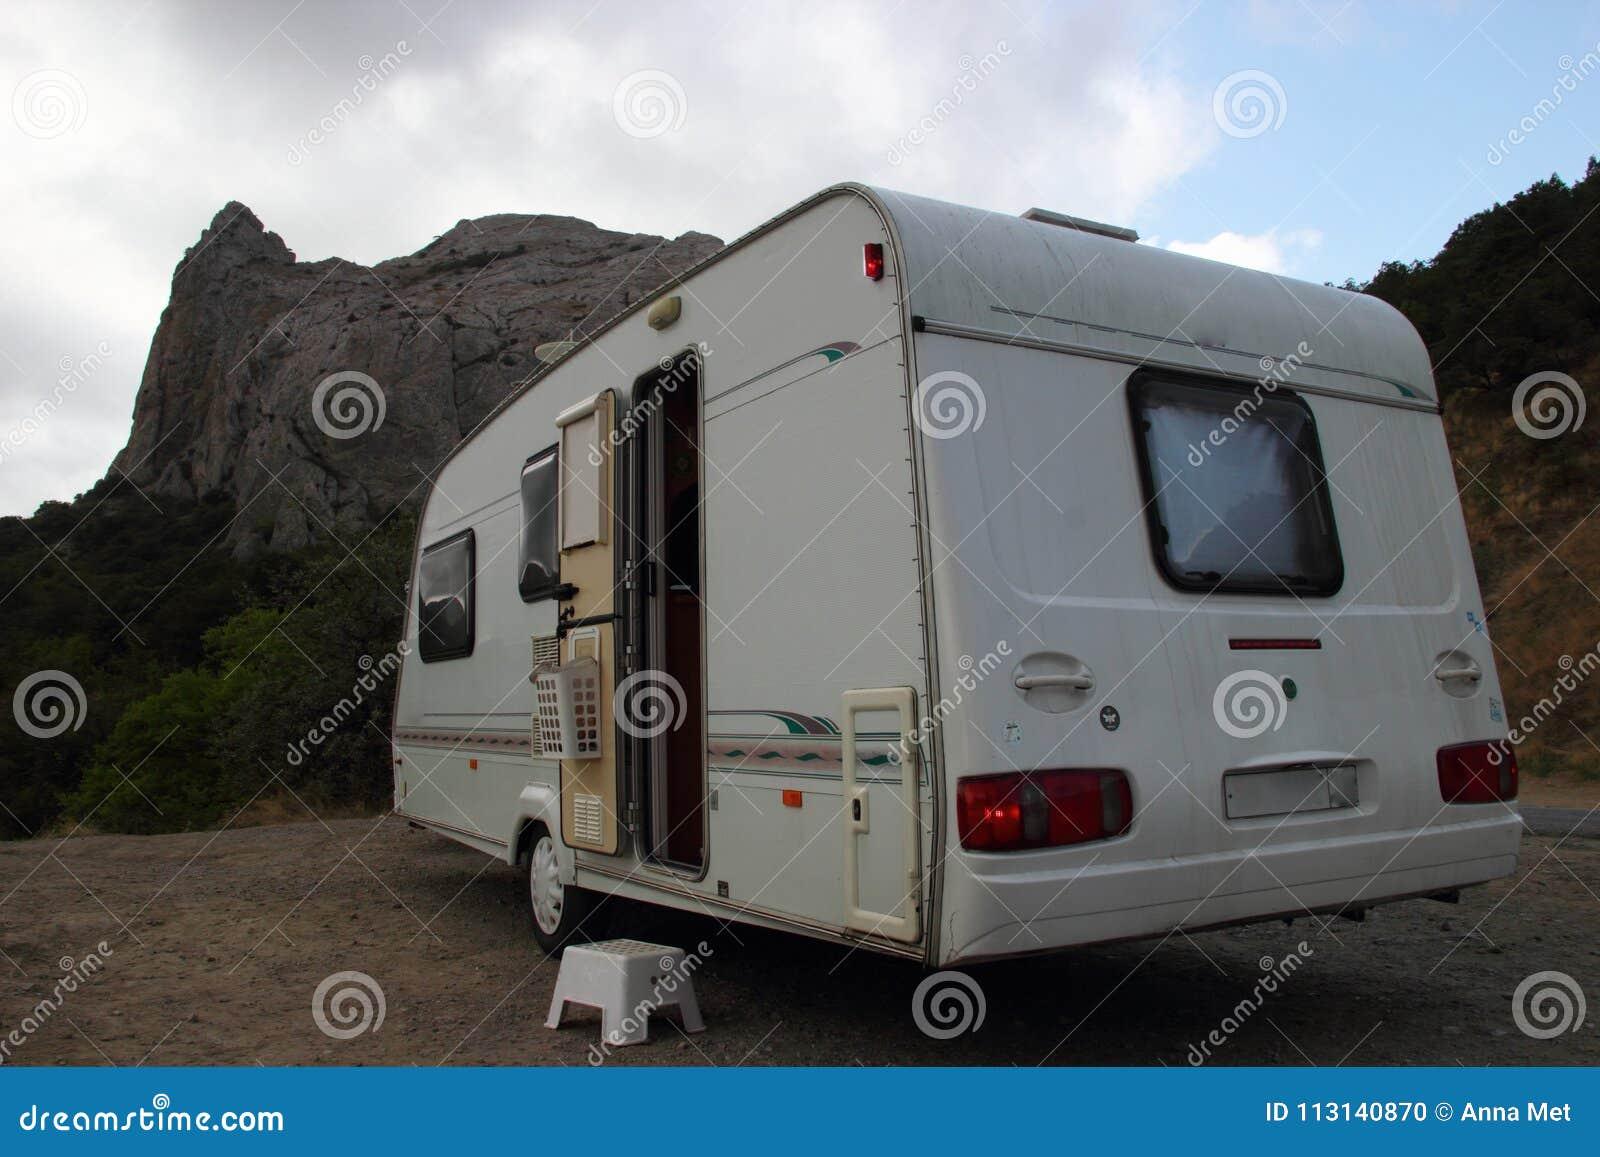 Kempin Wohnwagen Haus Dreht An Herein Die Berge Stockfoto Bild